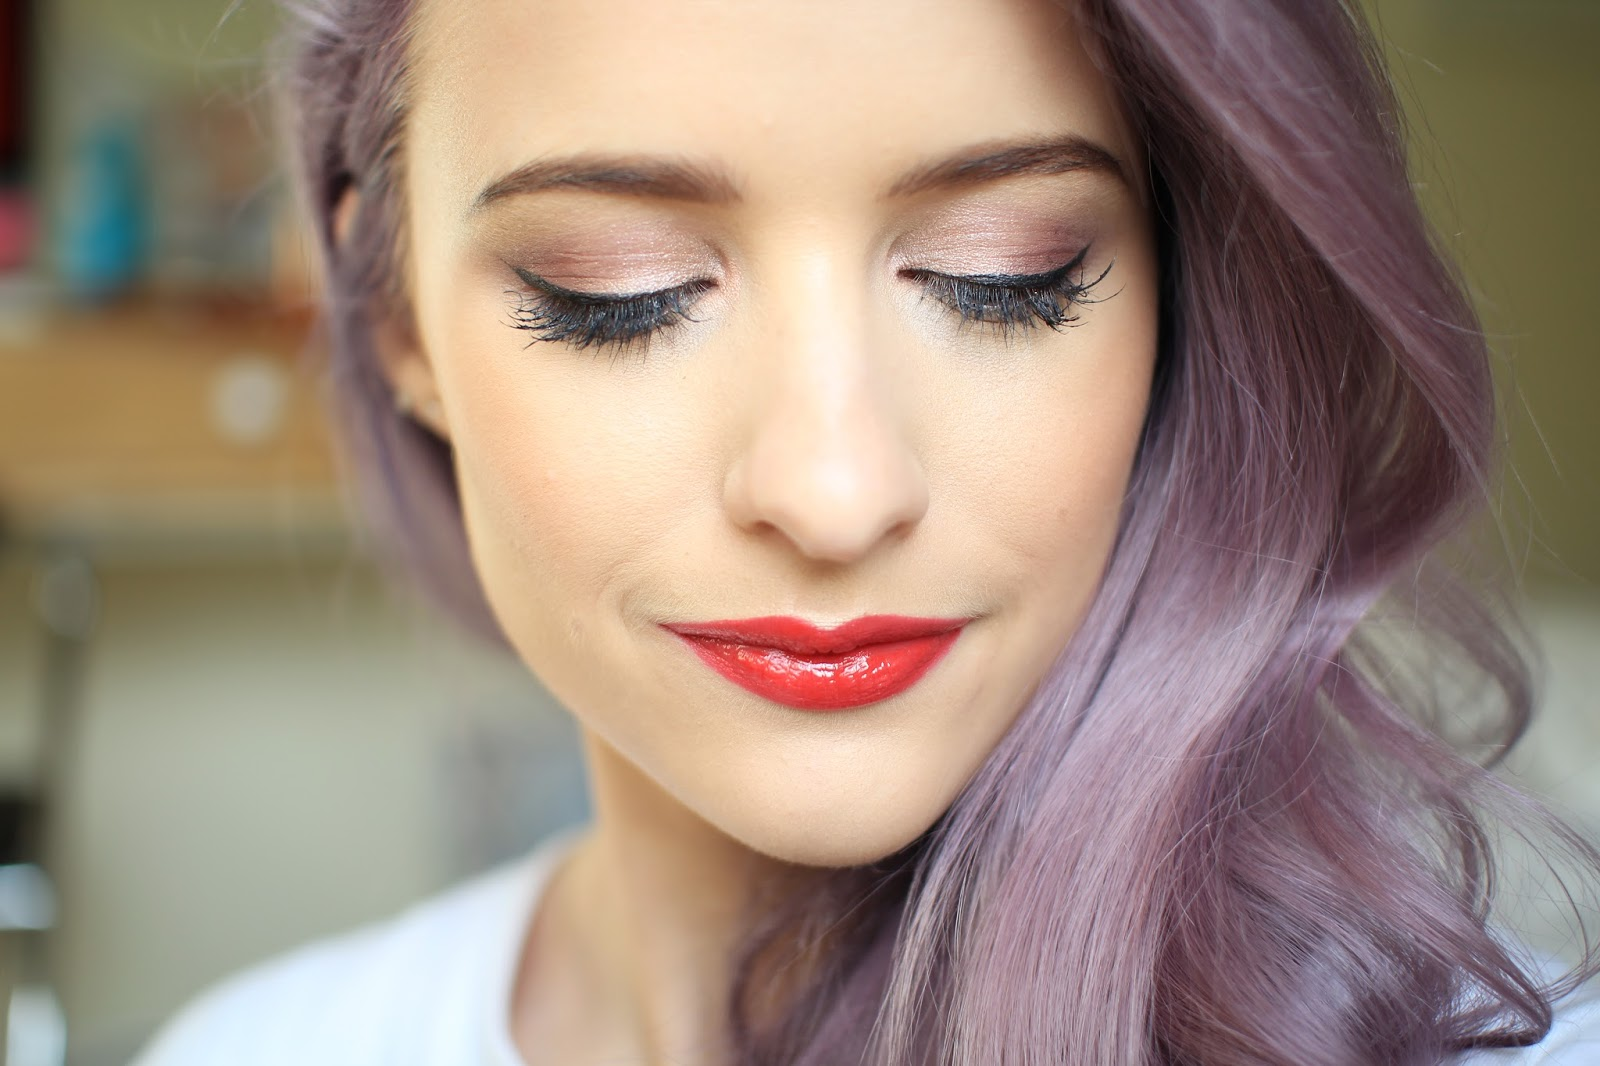 Charlotte Tilbury vintage vamp eyeshadow